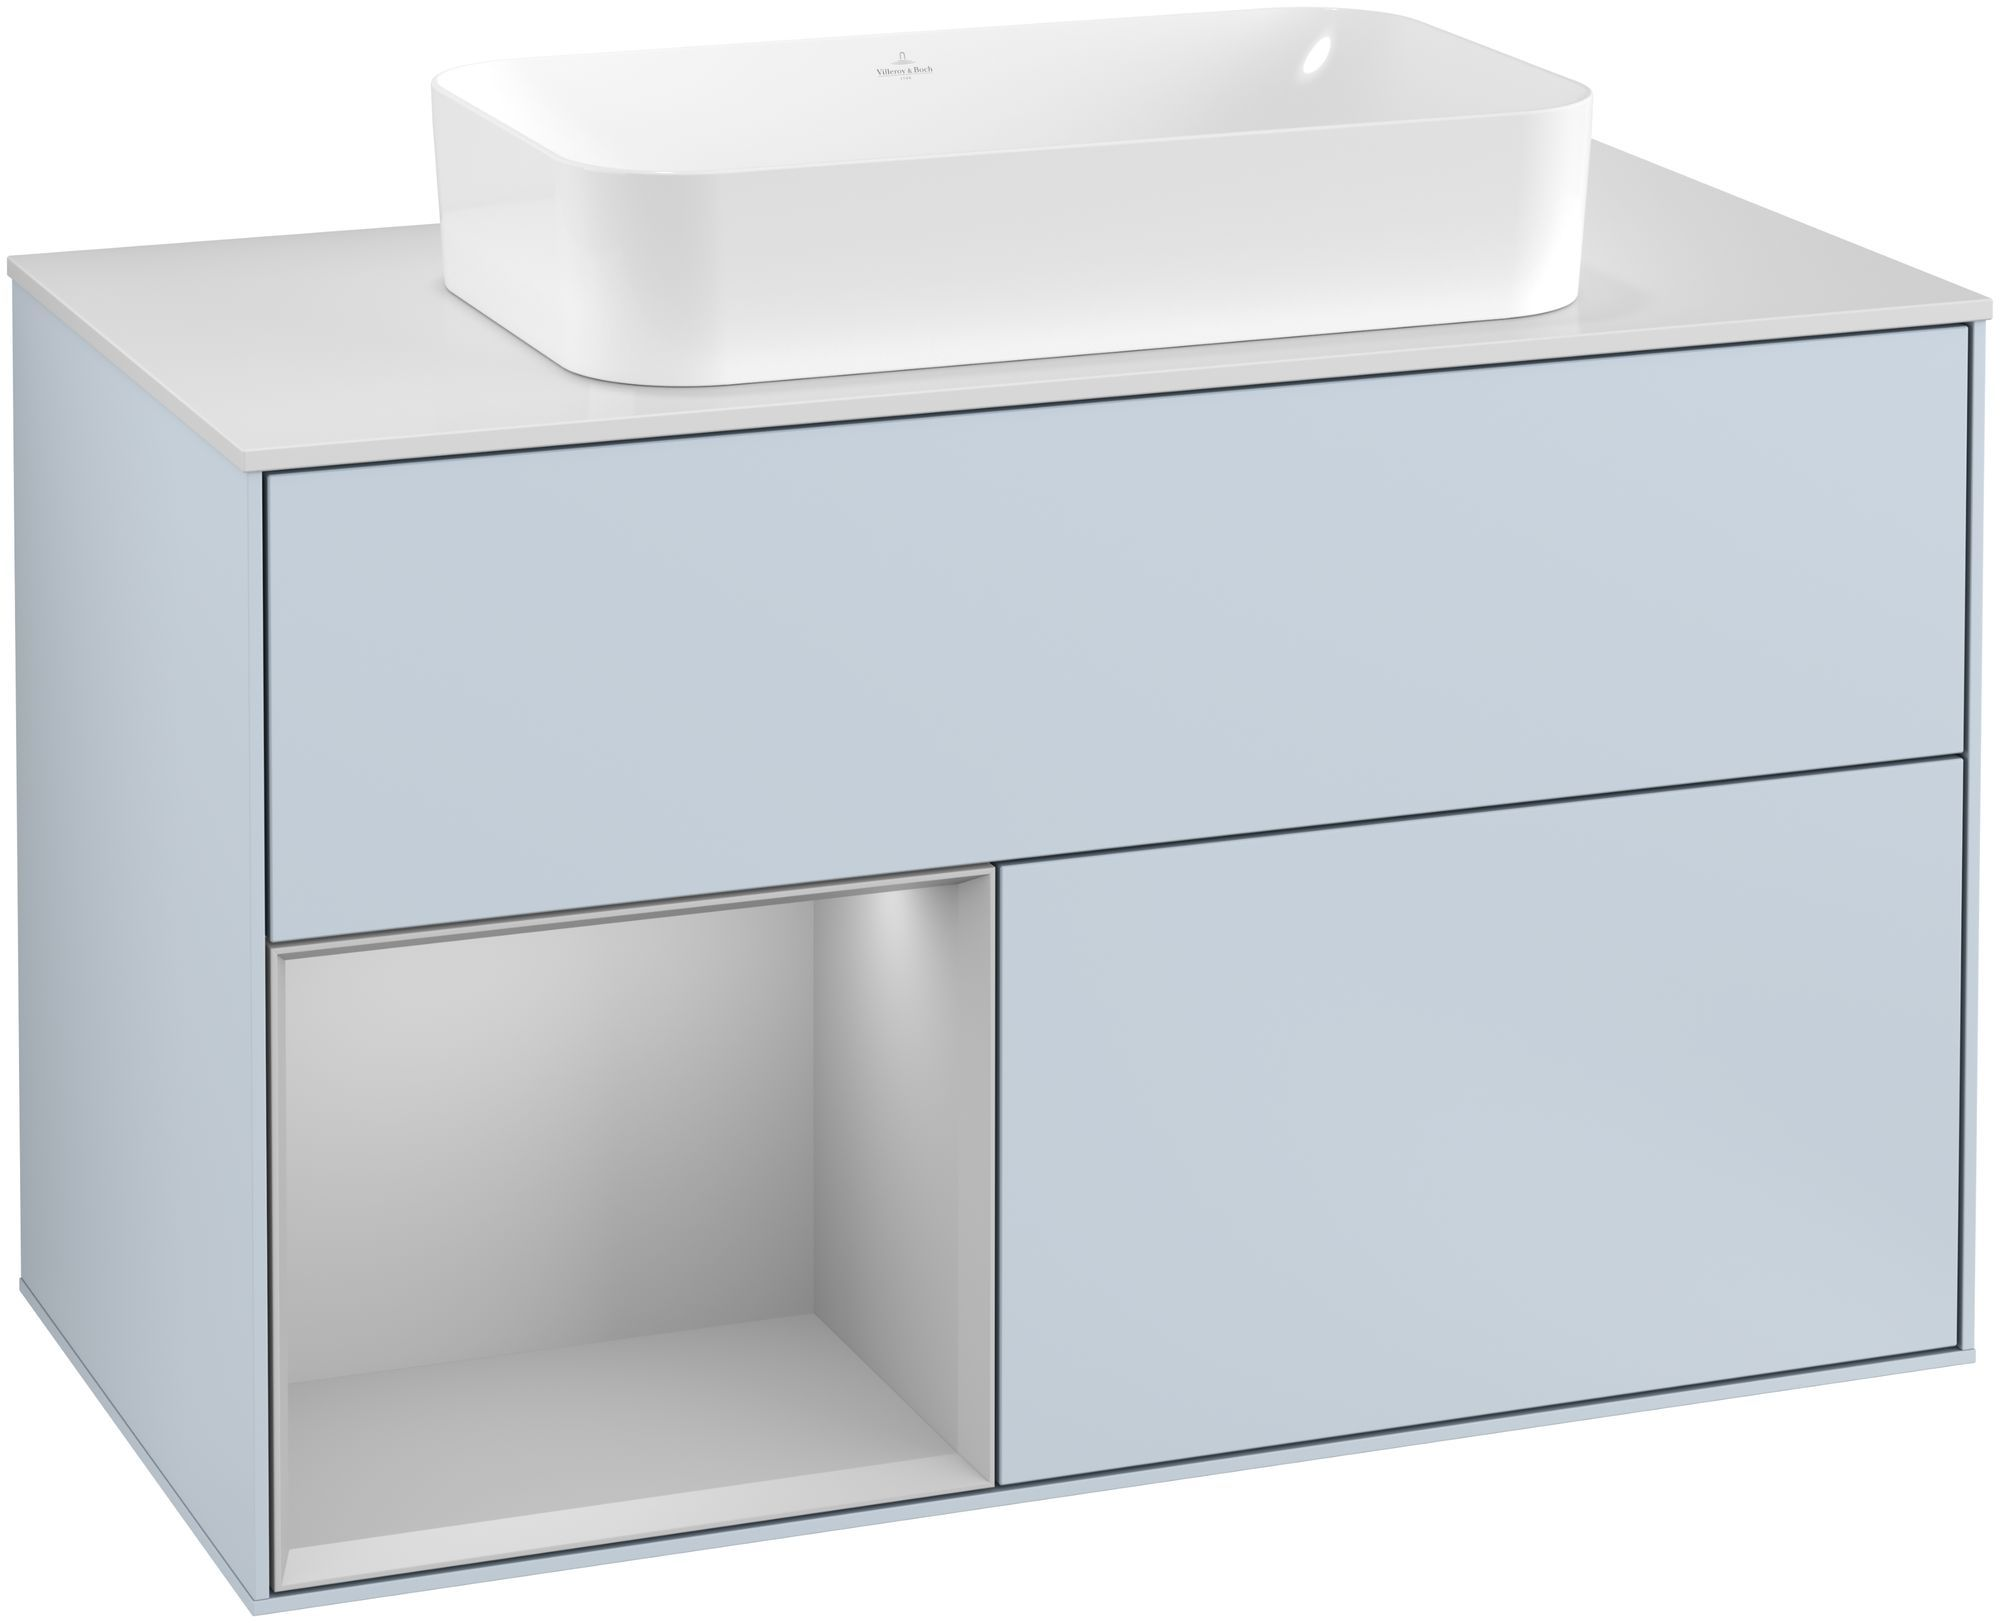 Villeroy & Boch Finion G24 Waschtischunterschrank mit Regalelement 2 Auszüge für WT mittig LED-Beleuchtung B:100xH:60,3xT:50,1cm Front, Korpus: Cloud, Regal: Light Grey Matt, Glasplatte: White Matt G241GJHA